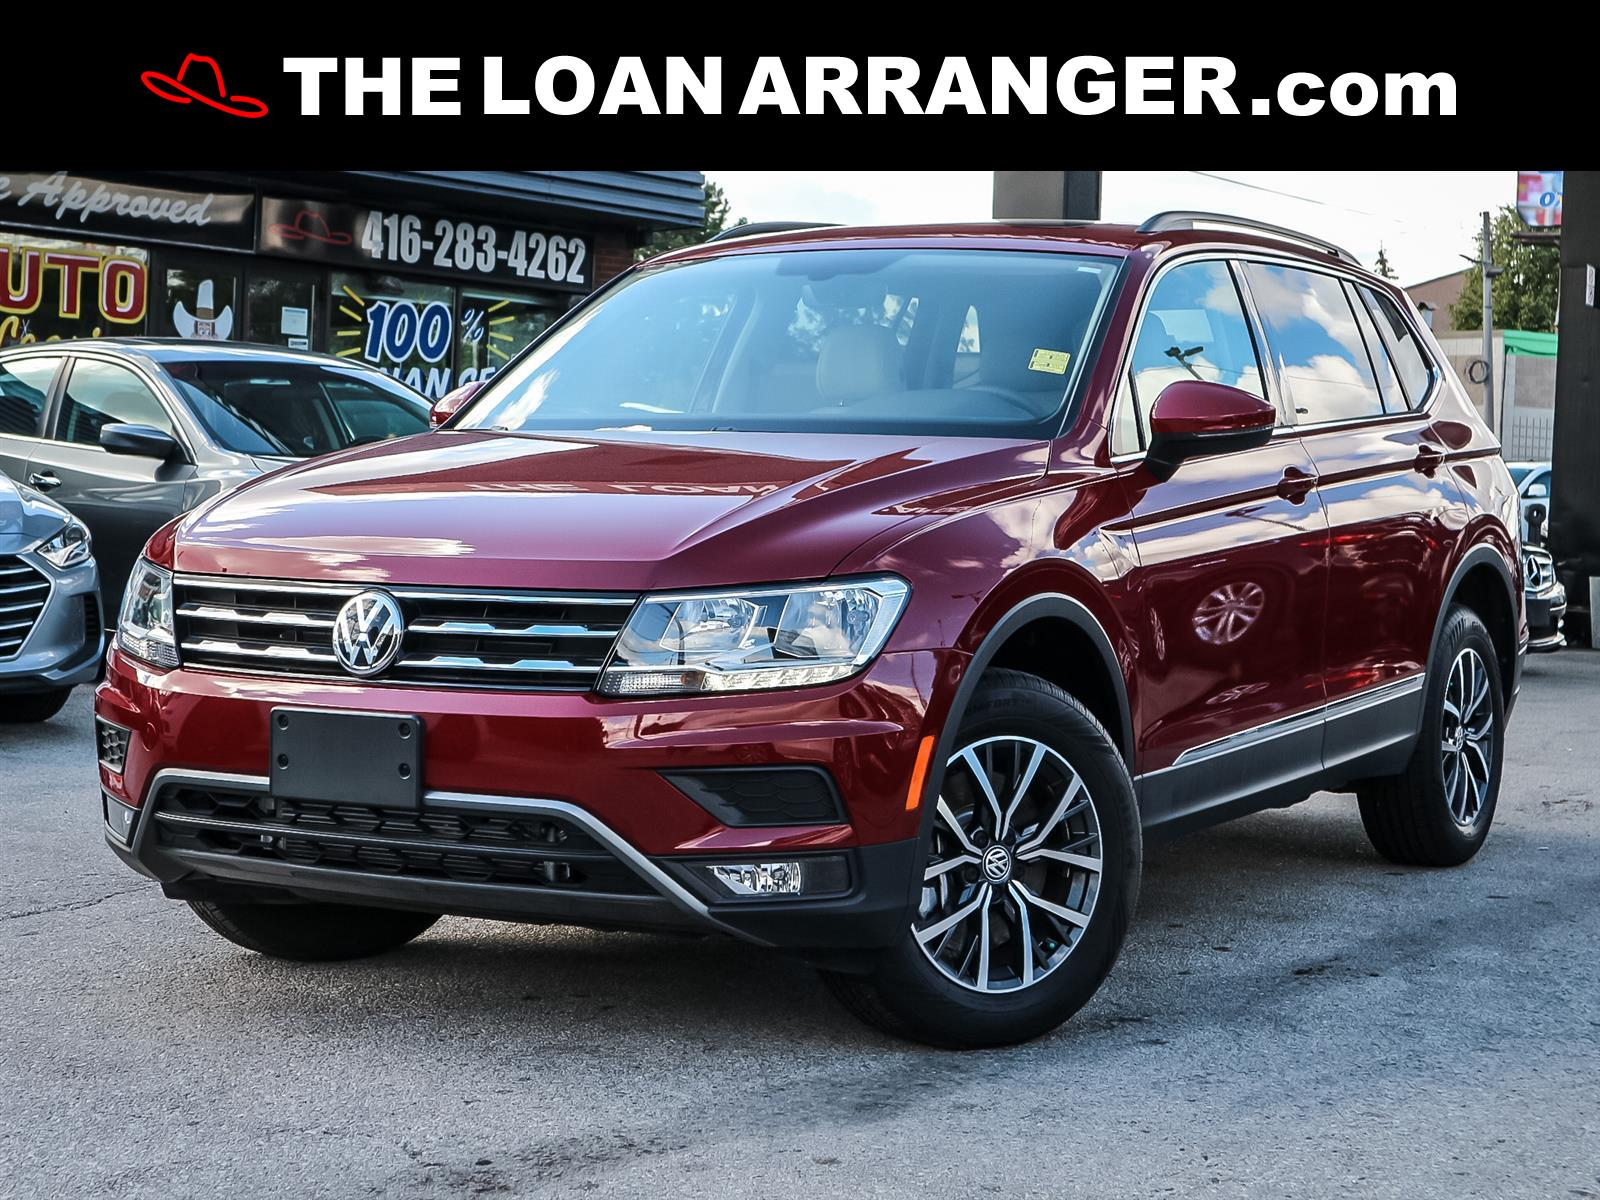 used 2020 Volkswagen Tiguan car